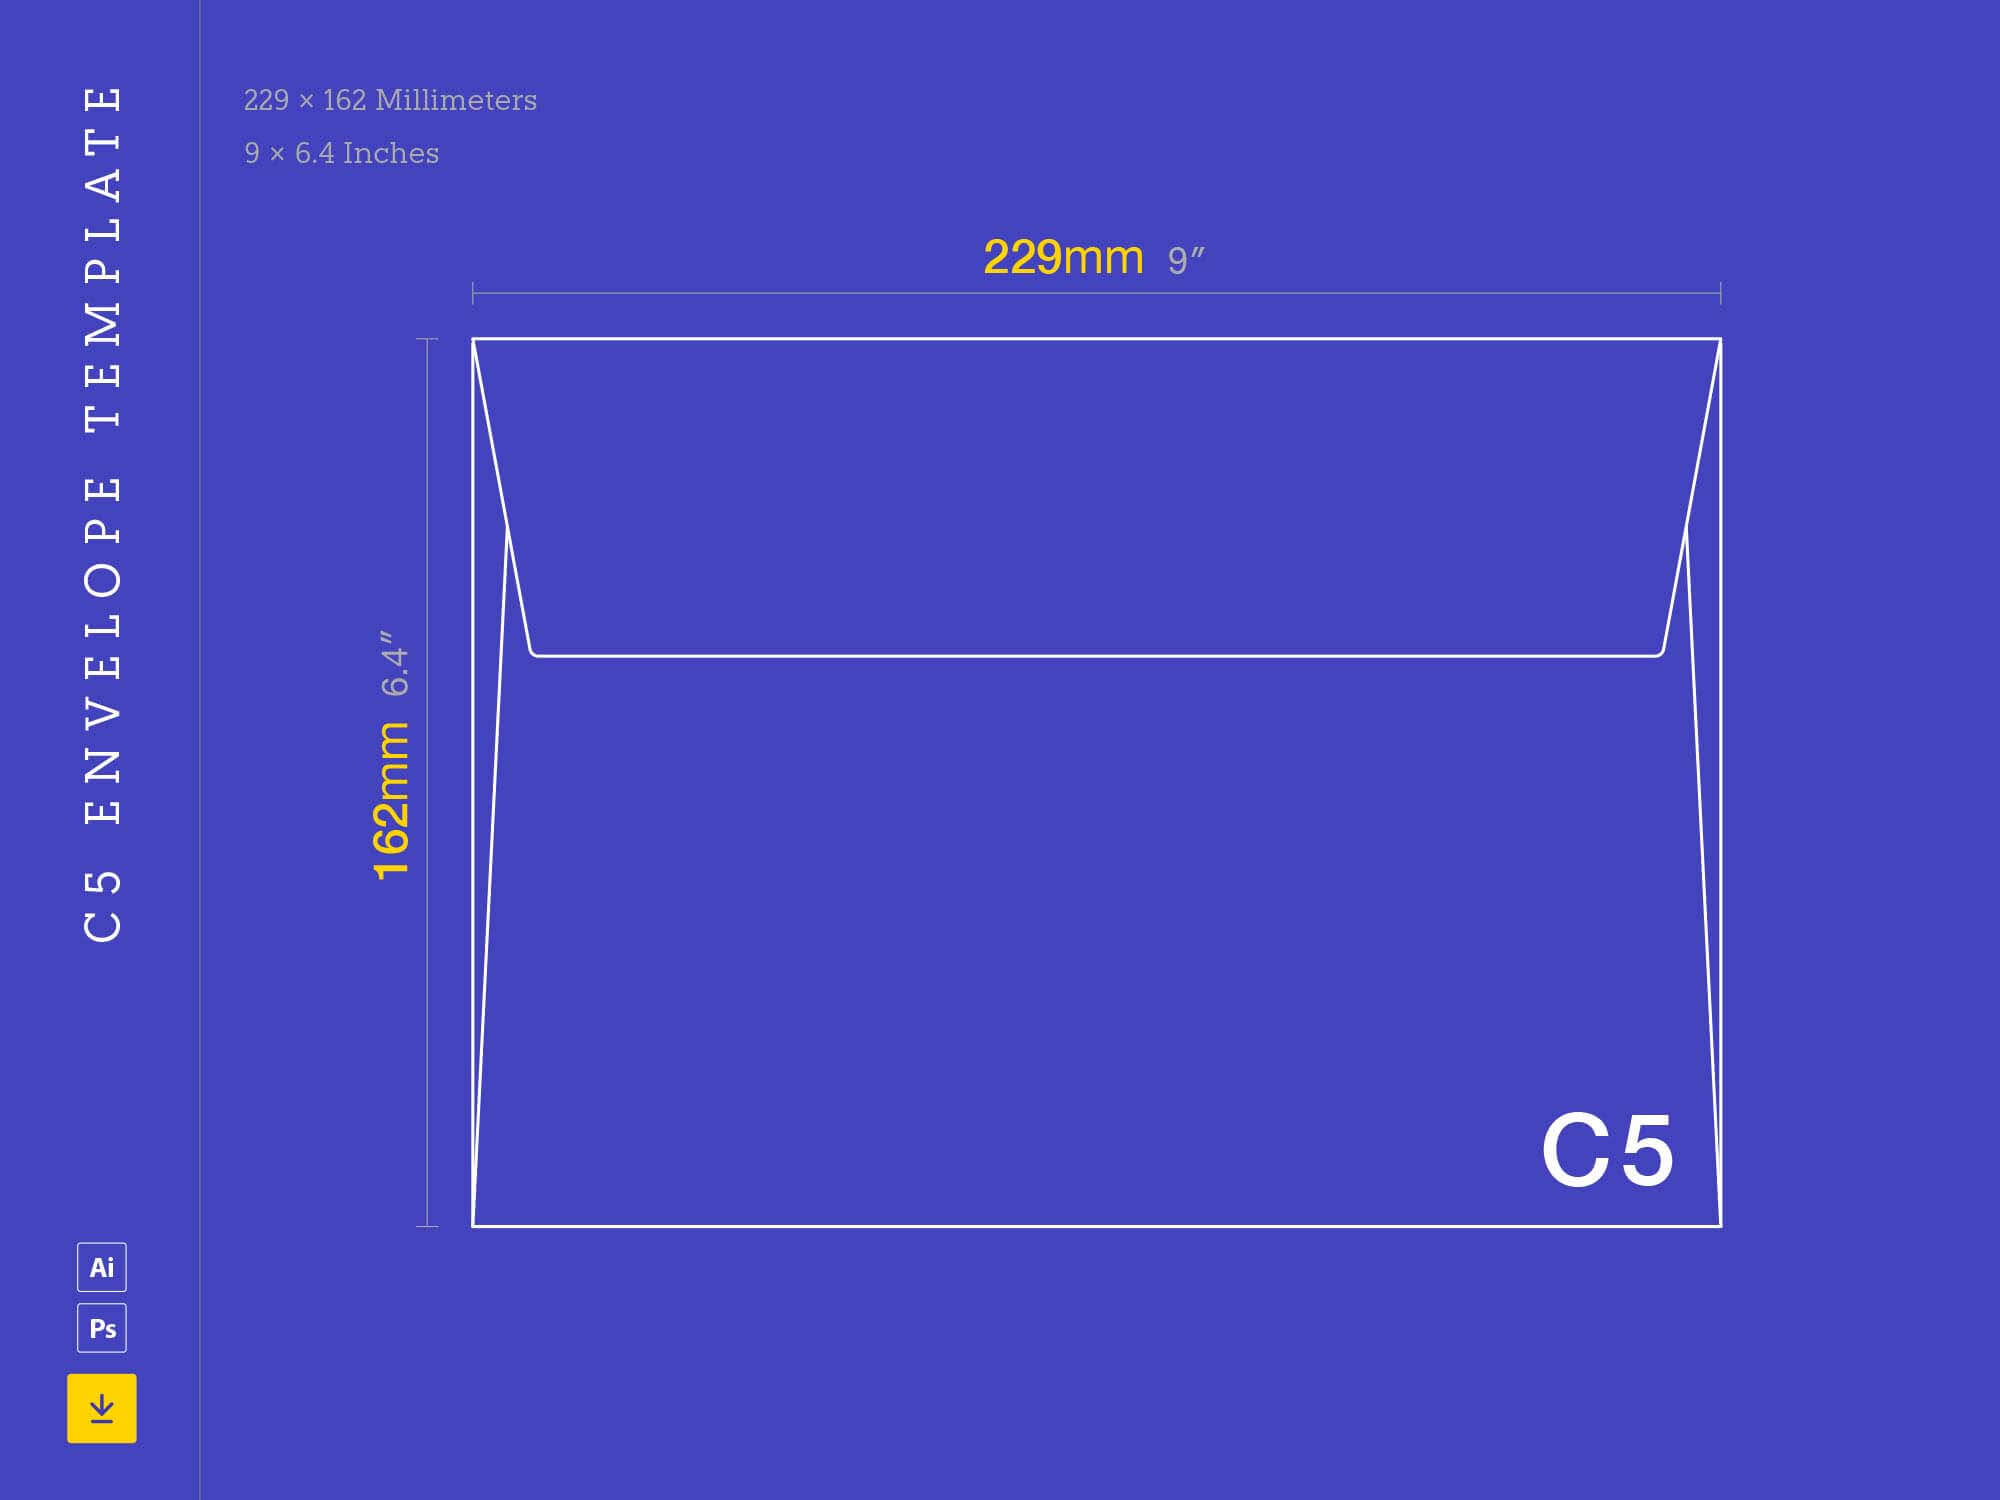 Free C5 Envelope Template (Ai, Psd) Regarding Business Envelope Template Illustrator